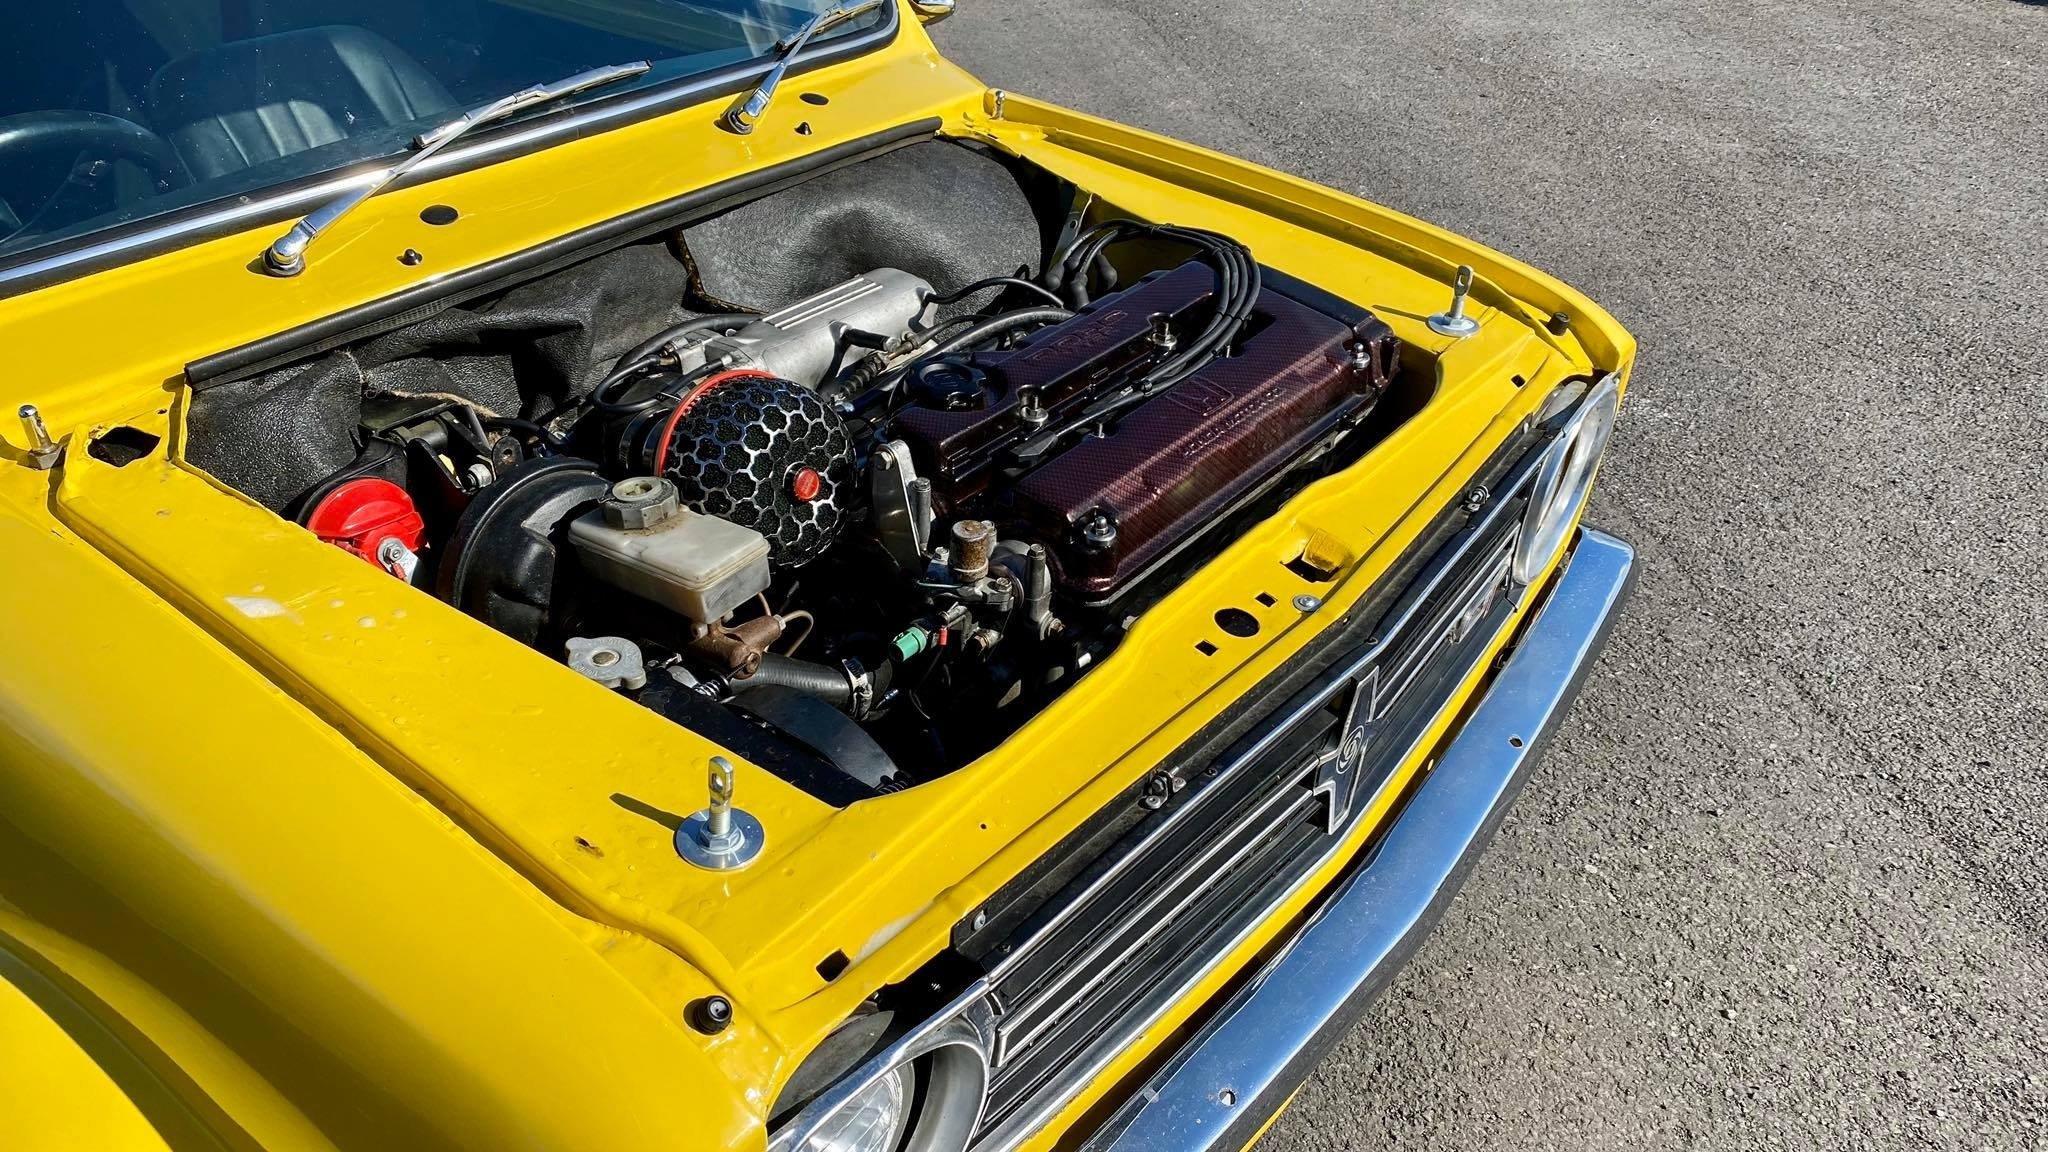 1968 Mini 2.0l honda vtech engine For Sale (picture 3 of 6)